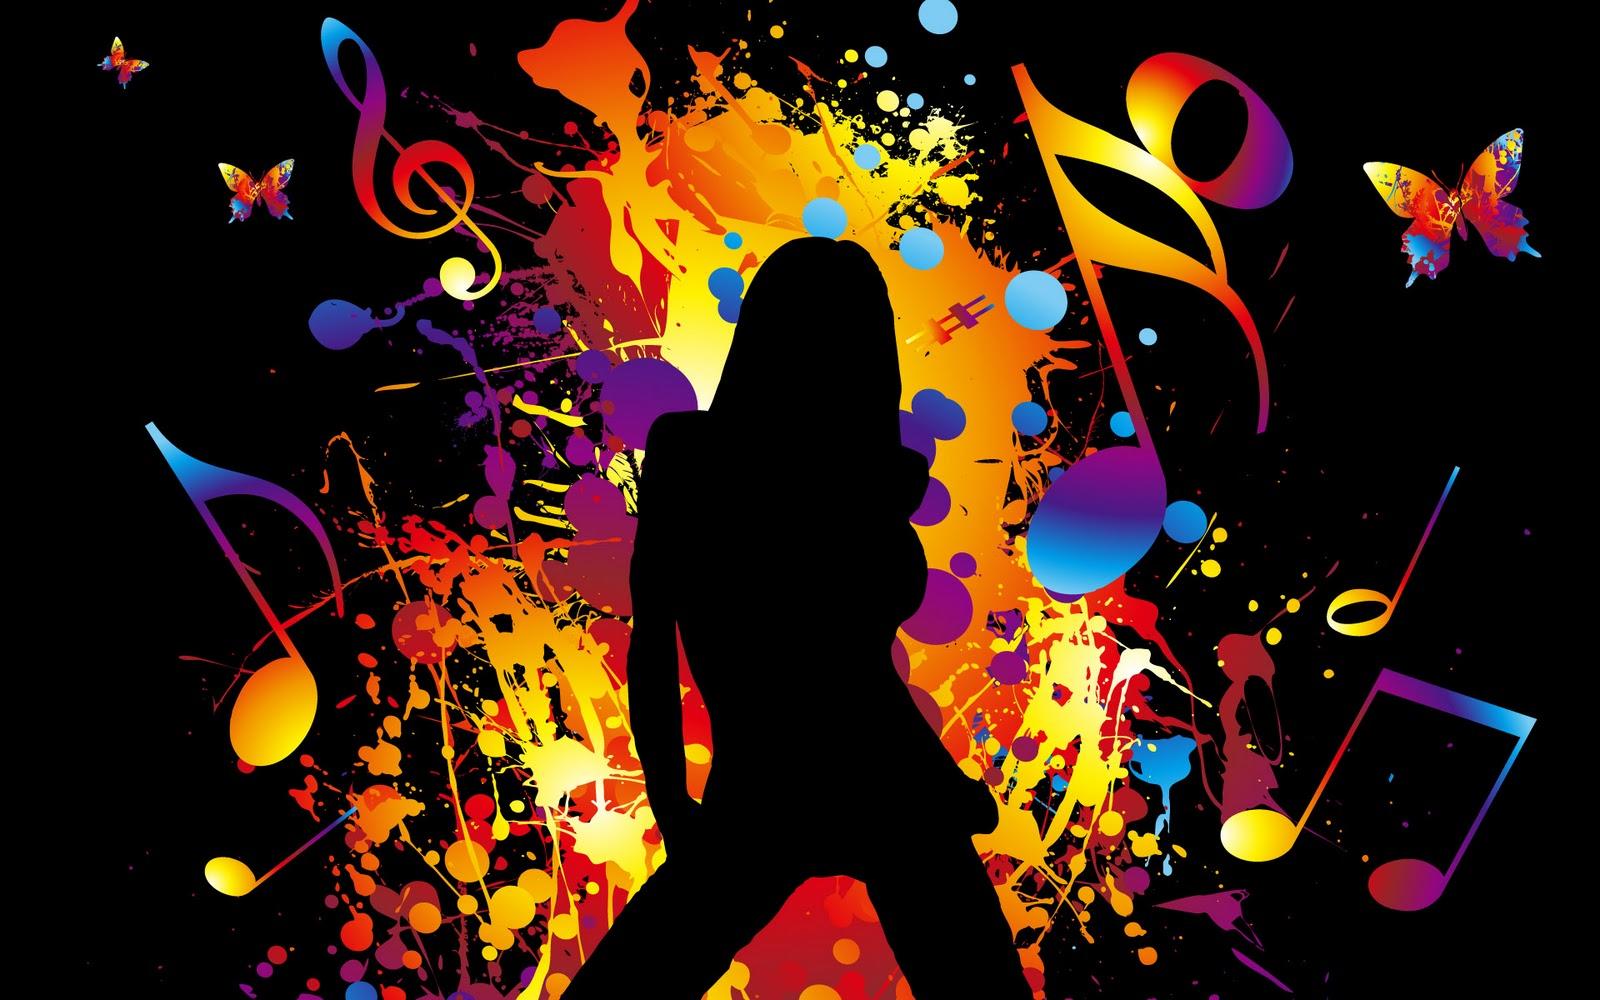 Wallpaper Musik  Gambar Musik Keren Part 3